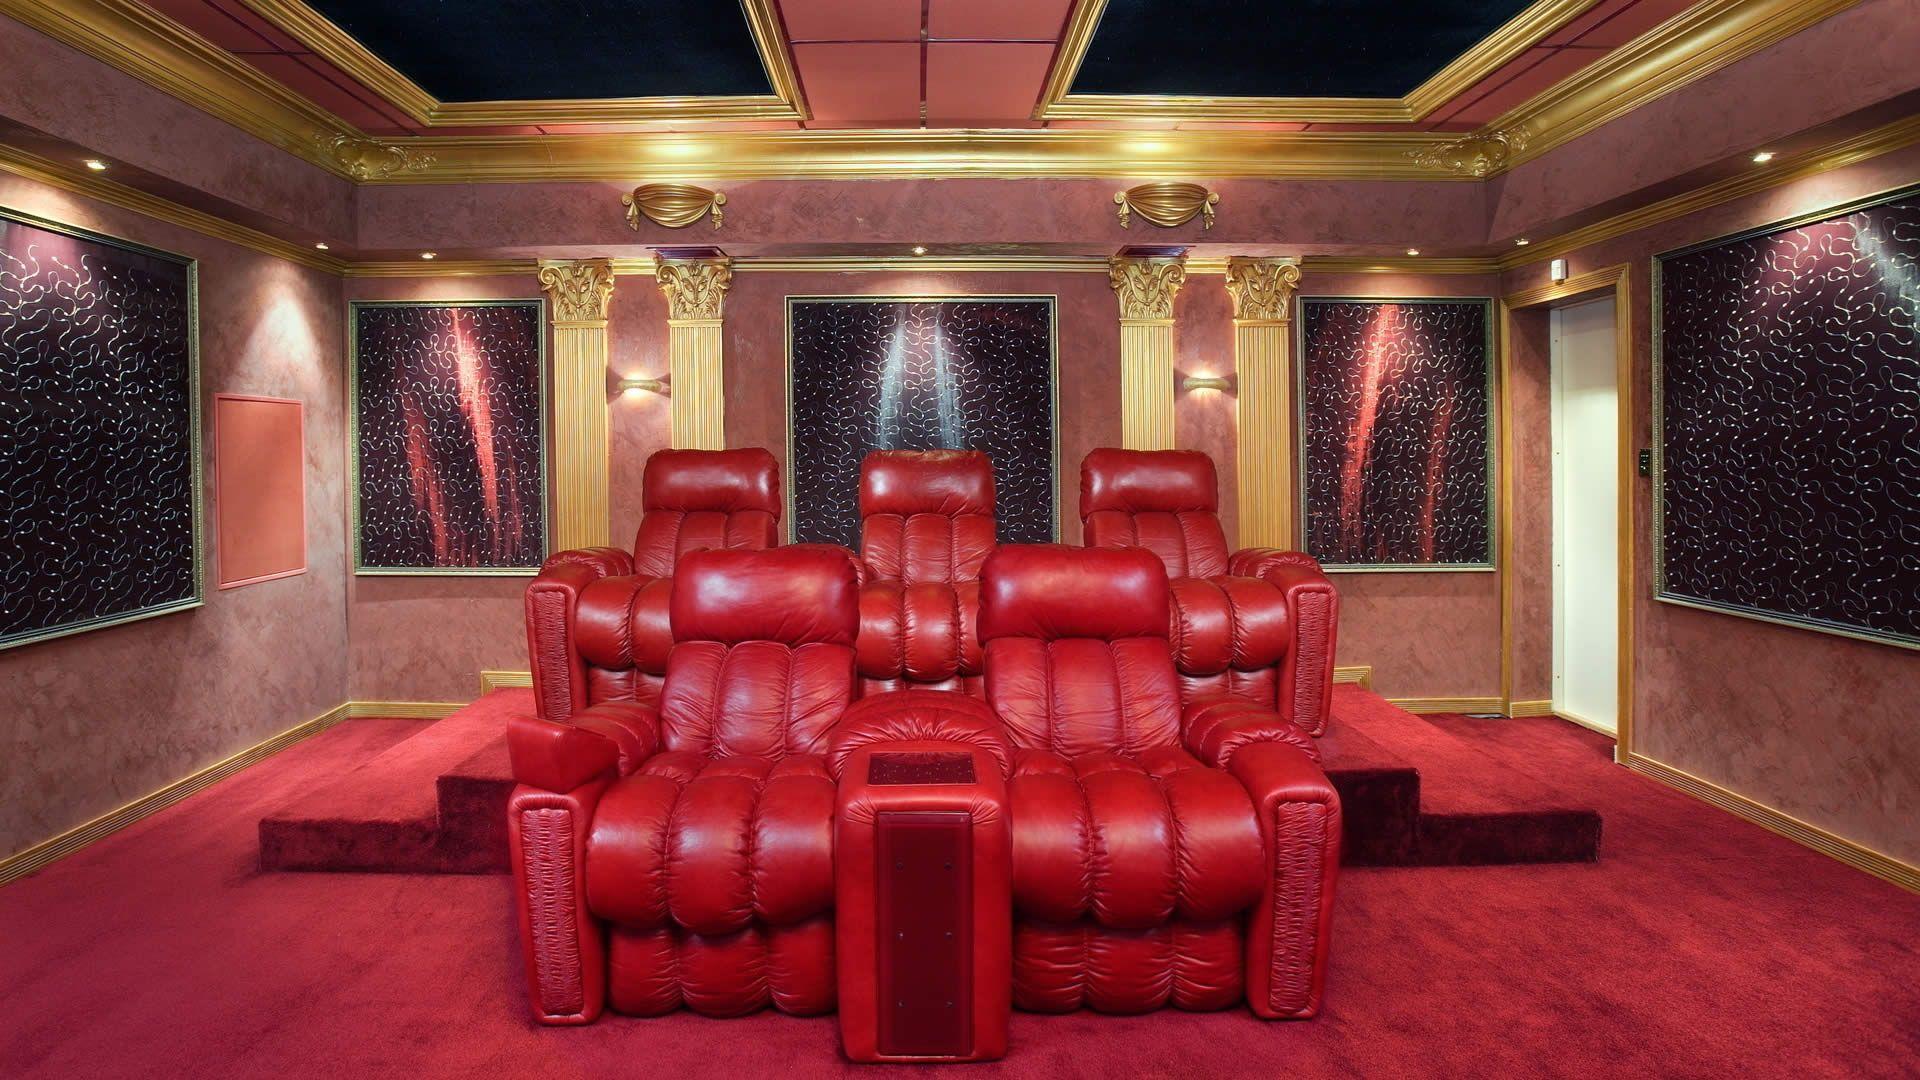 Movie Theater wallpaper image